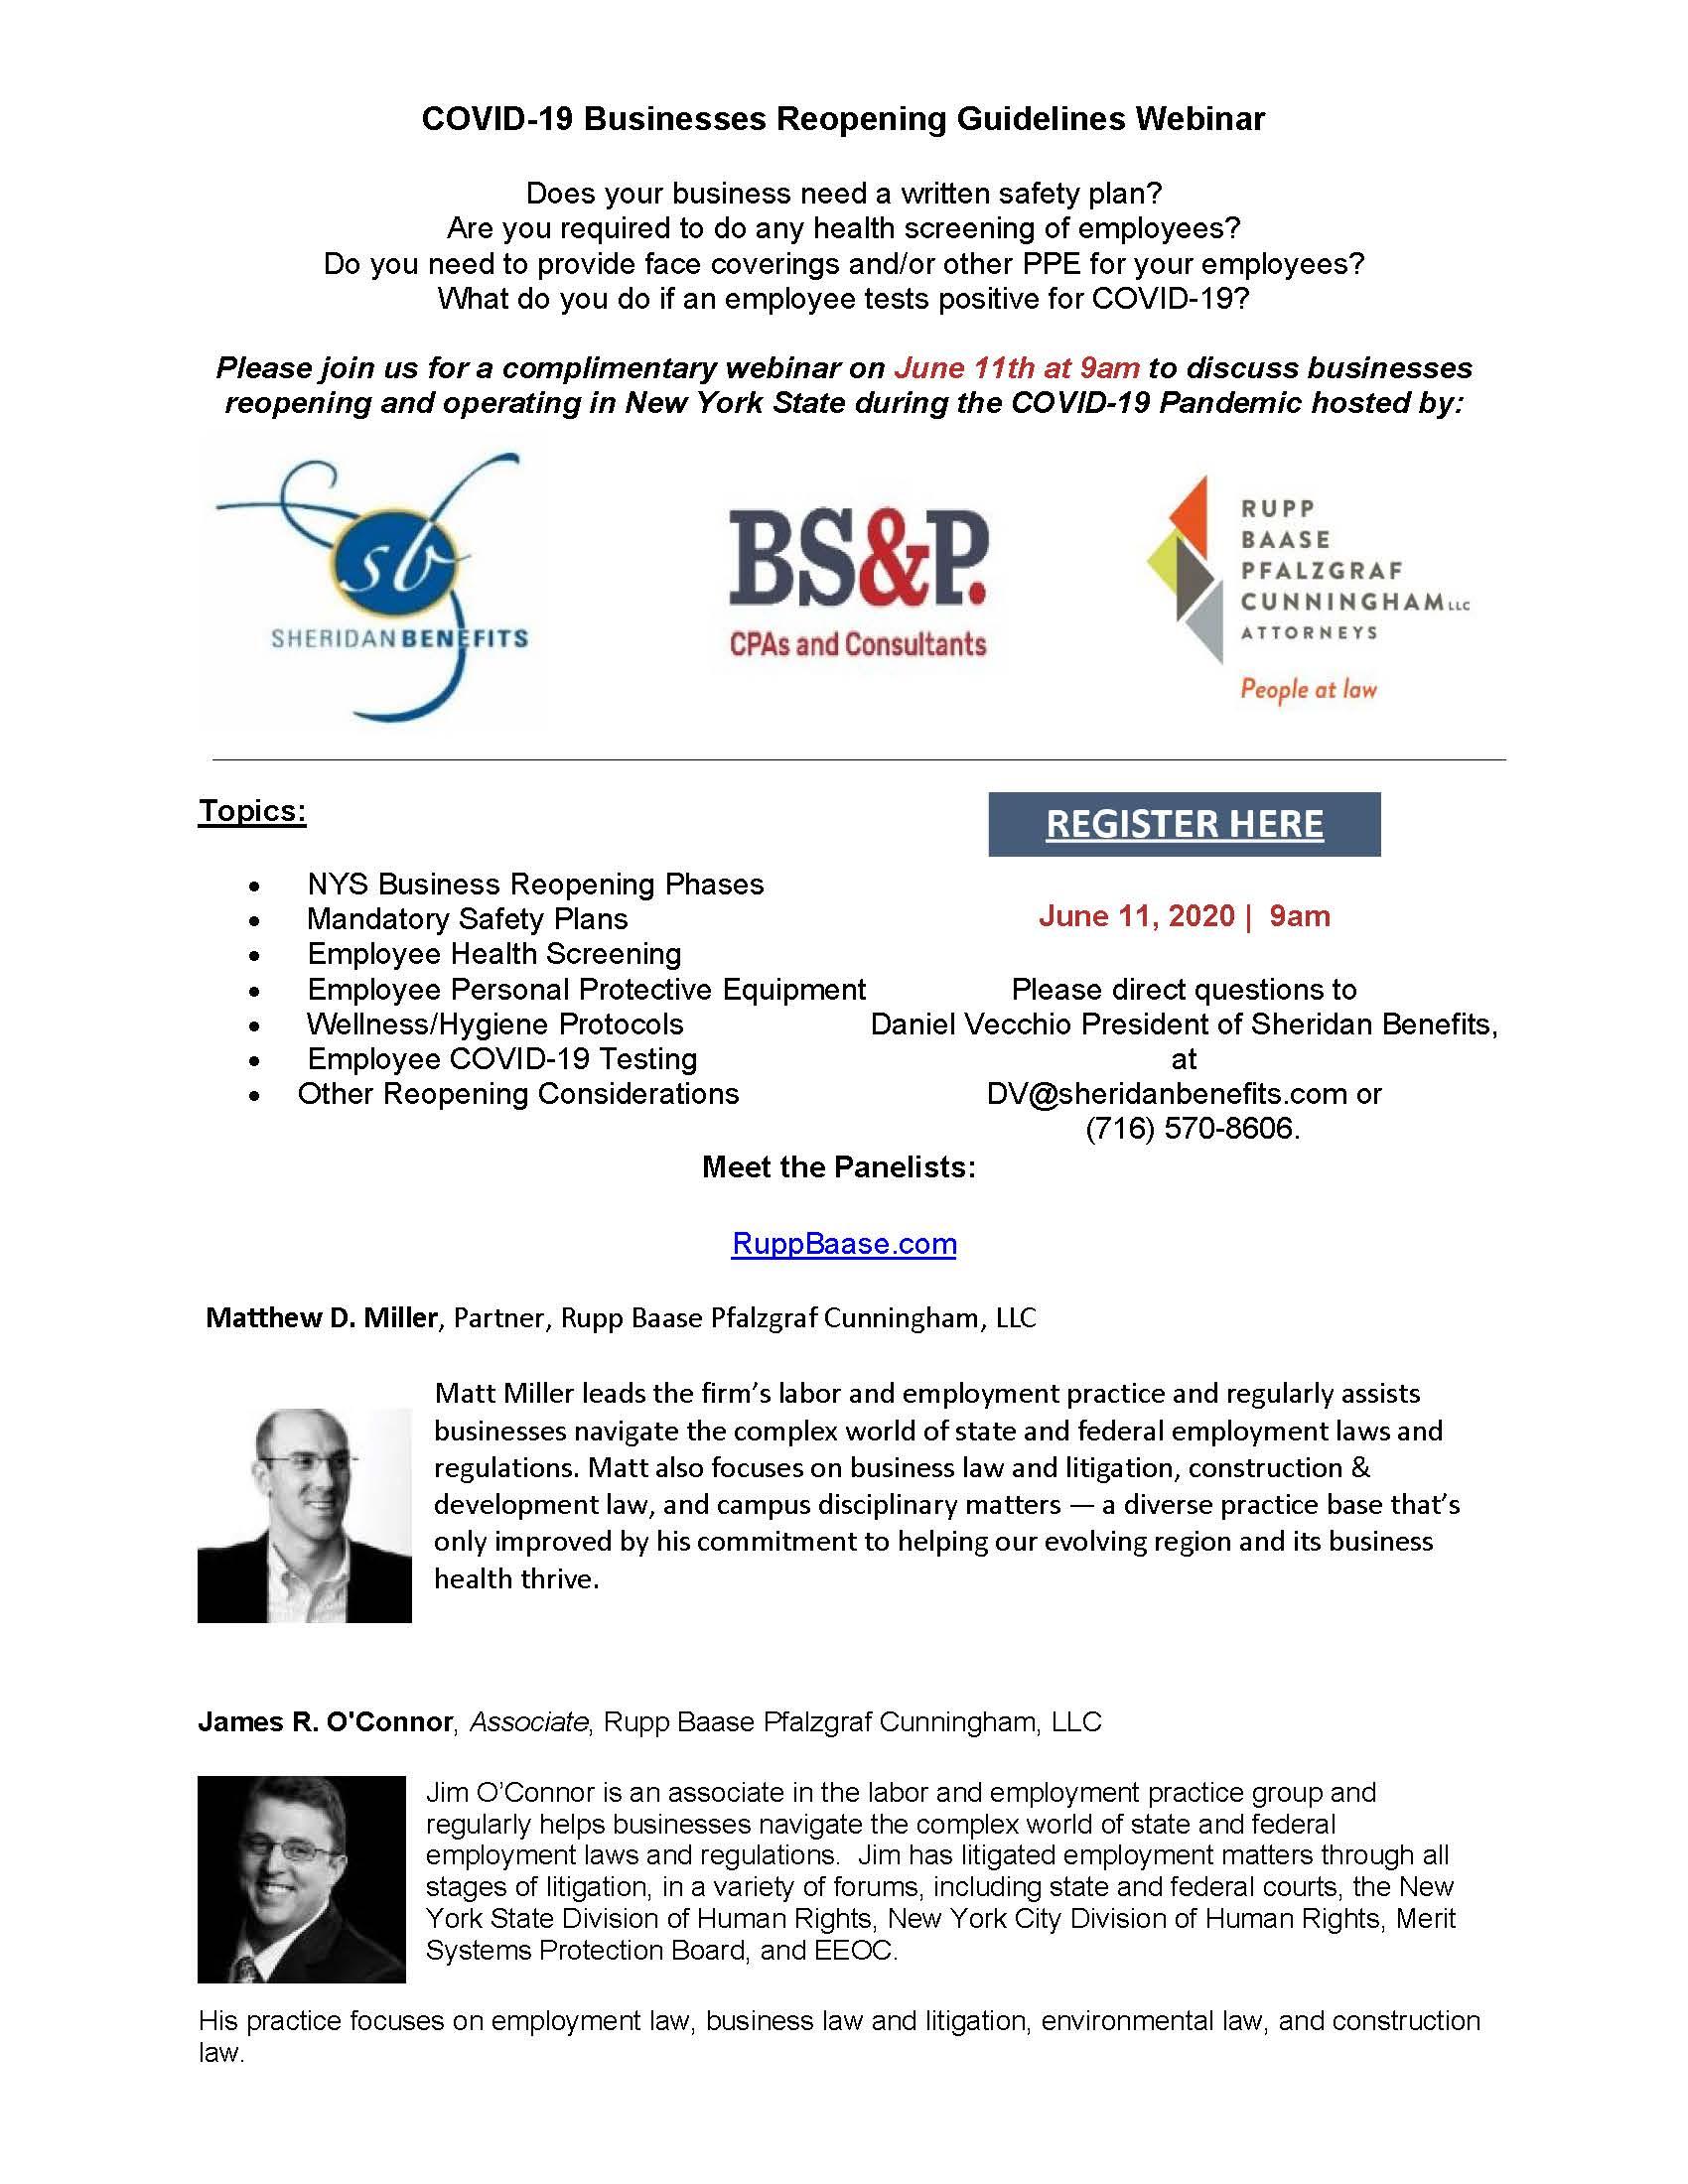 COVID Business Reopening Webinar flyer |  Buffalo, NY | Sheridan Benefits, LLC